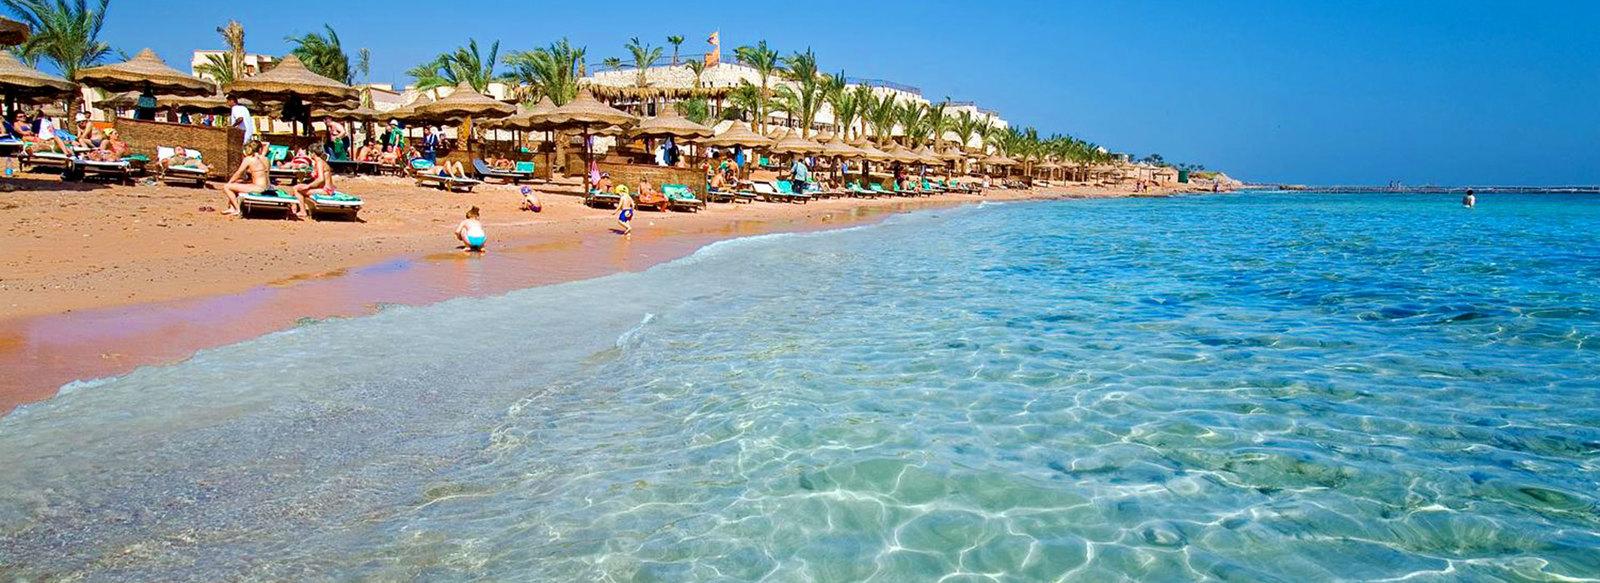 Miglior prezzo Eden Village Premium Tamra Beach - Sharm El ...